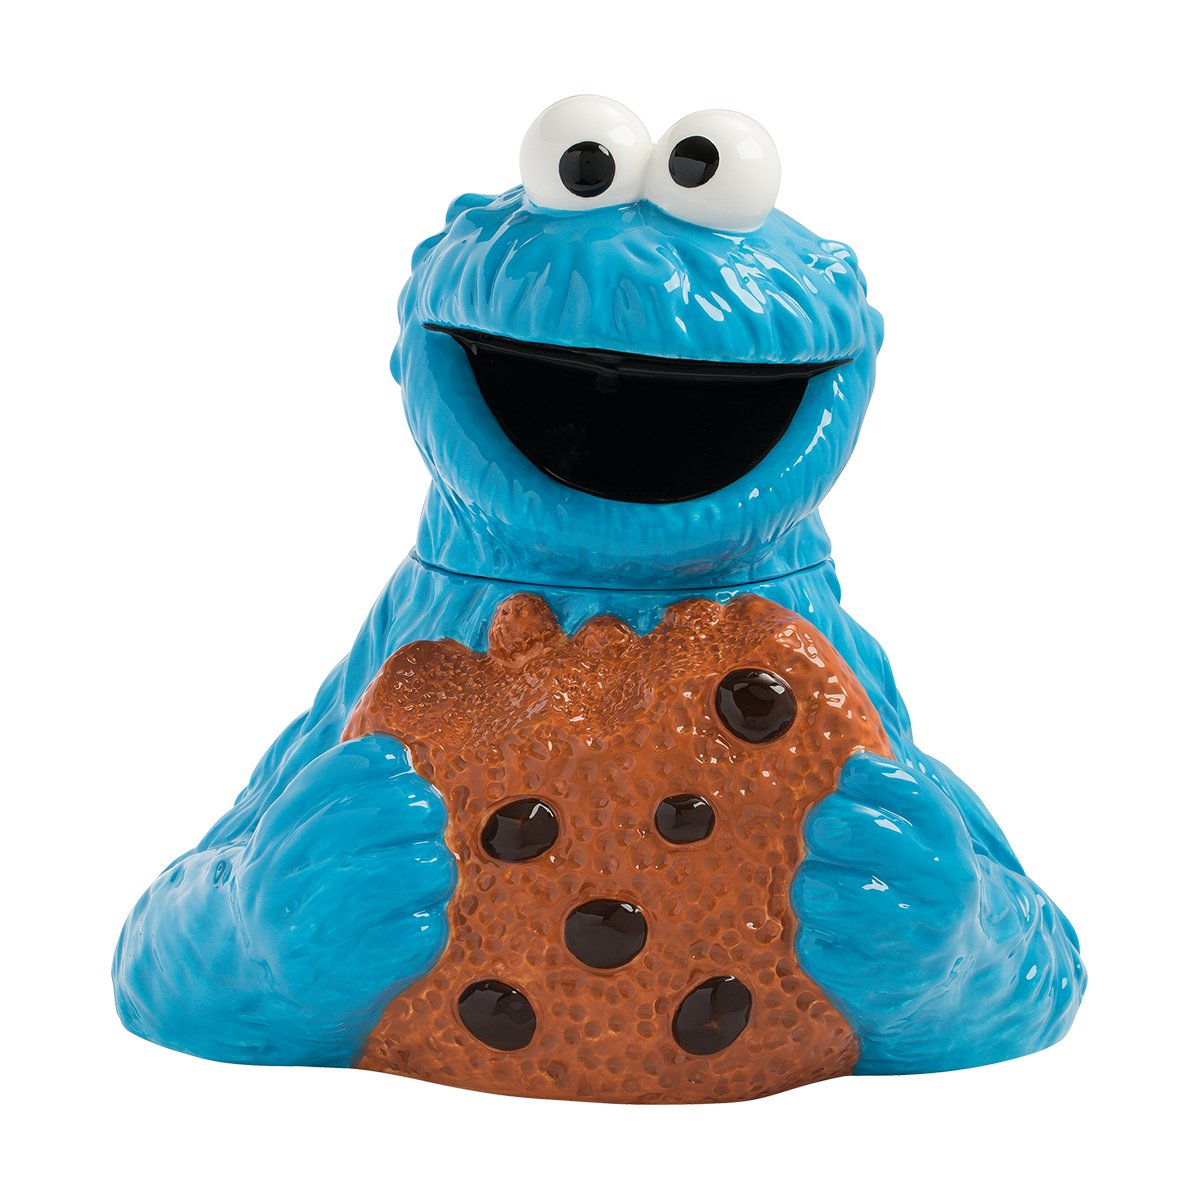 Super Cool Looking Cookie Jars The Sugar Free Diva